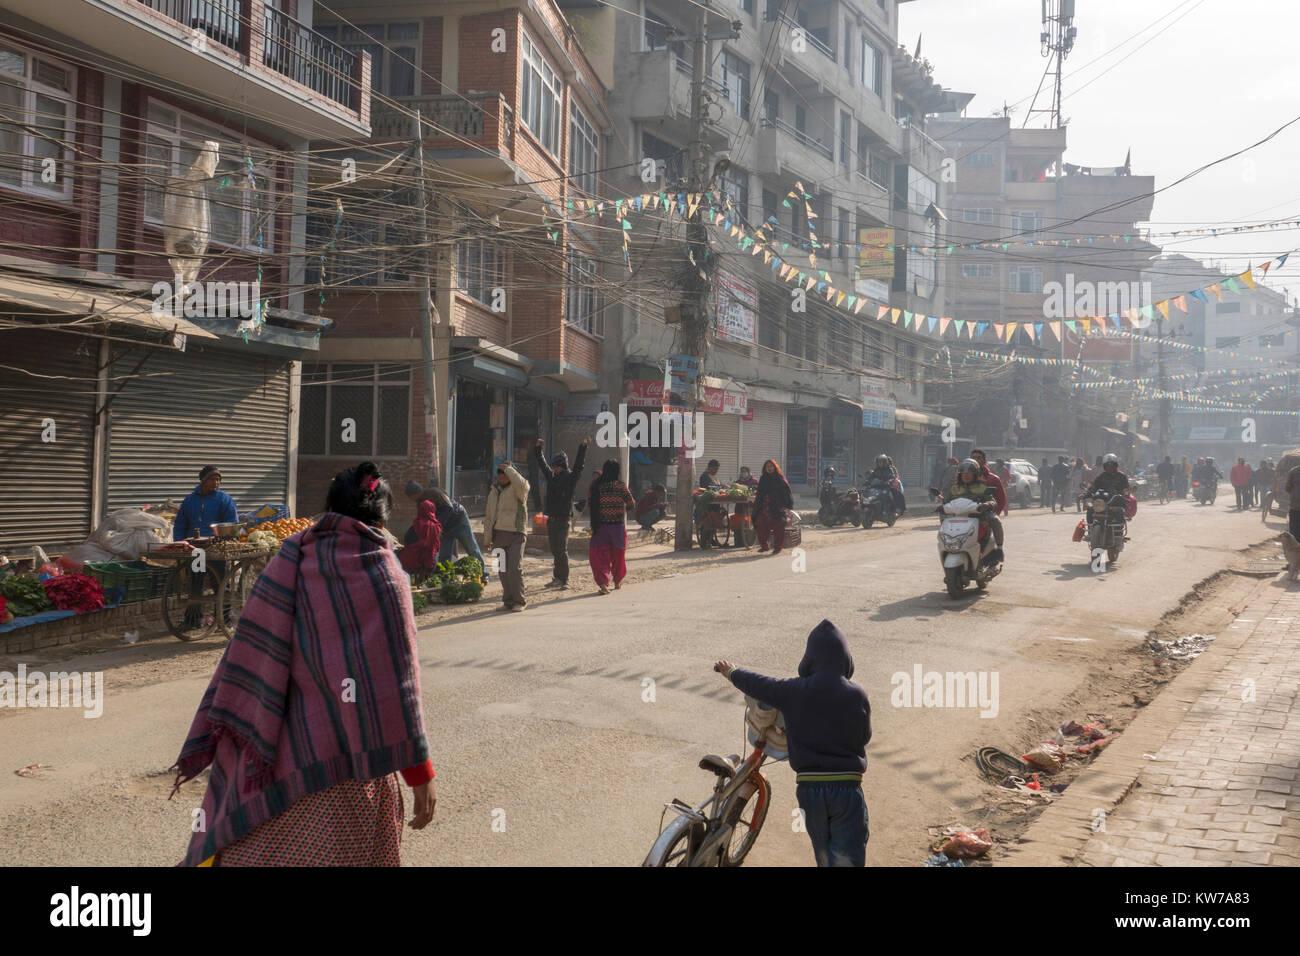 People in cold dusty streets of wintertime Kathmandu, Nepal - Stock Image